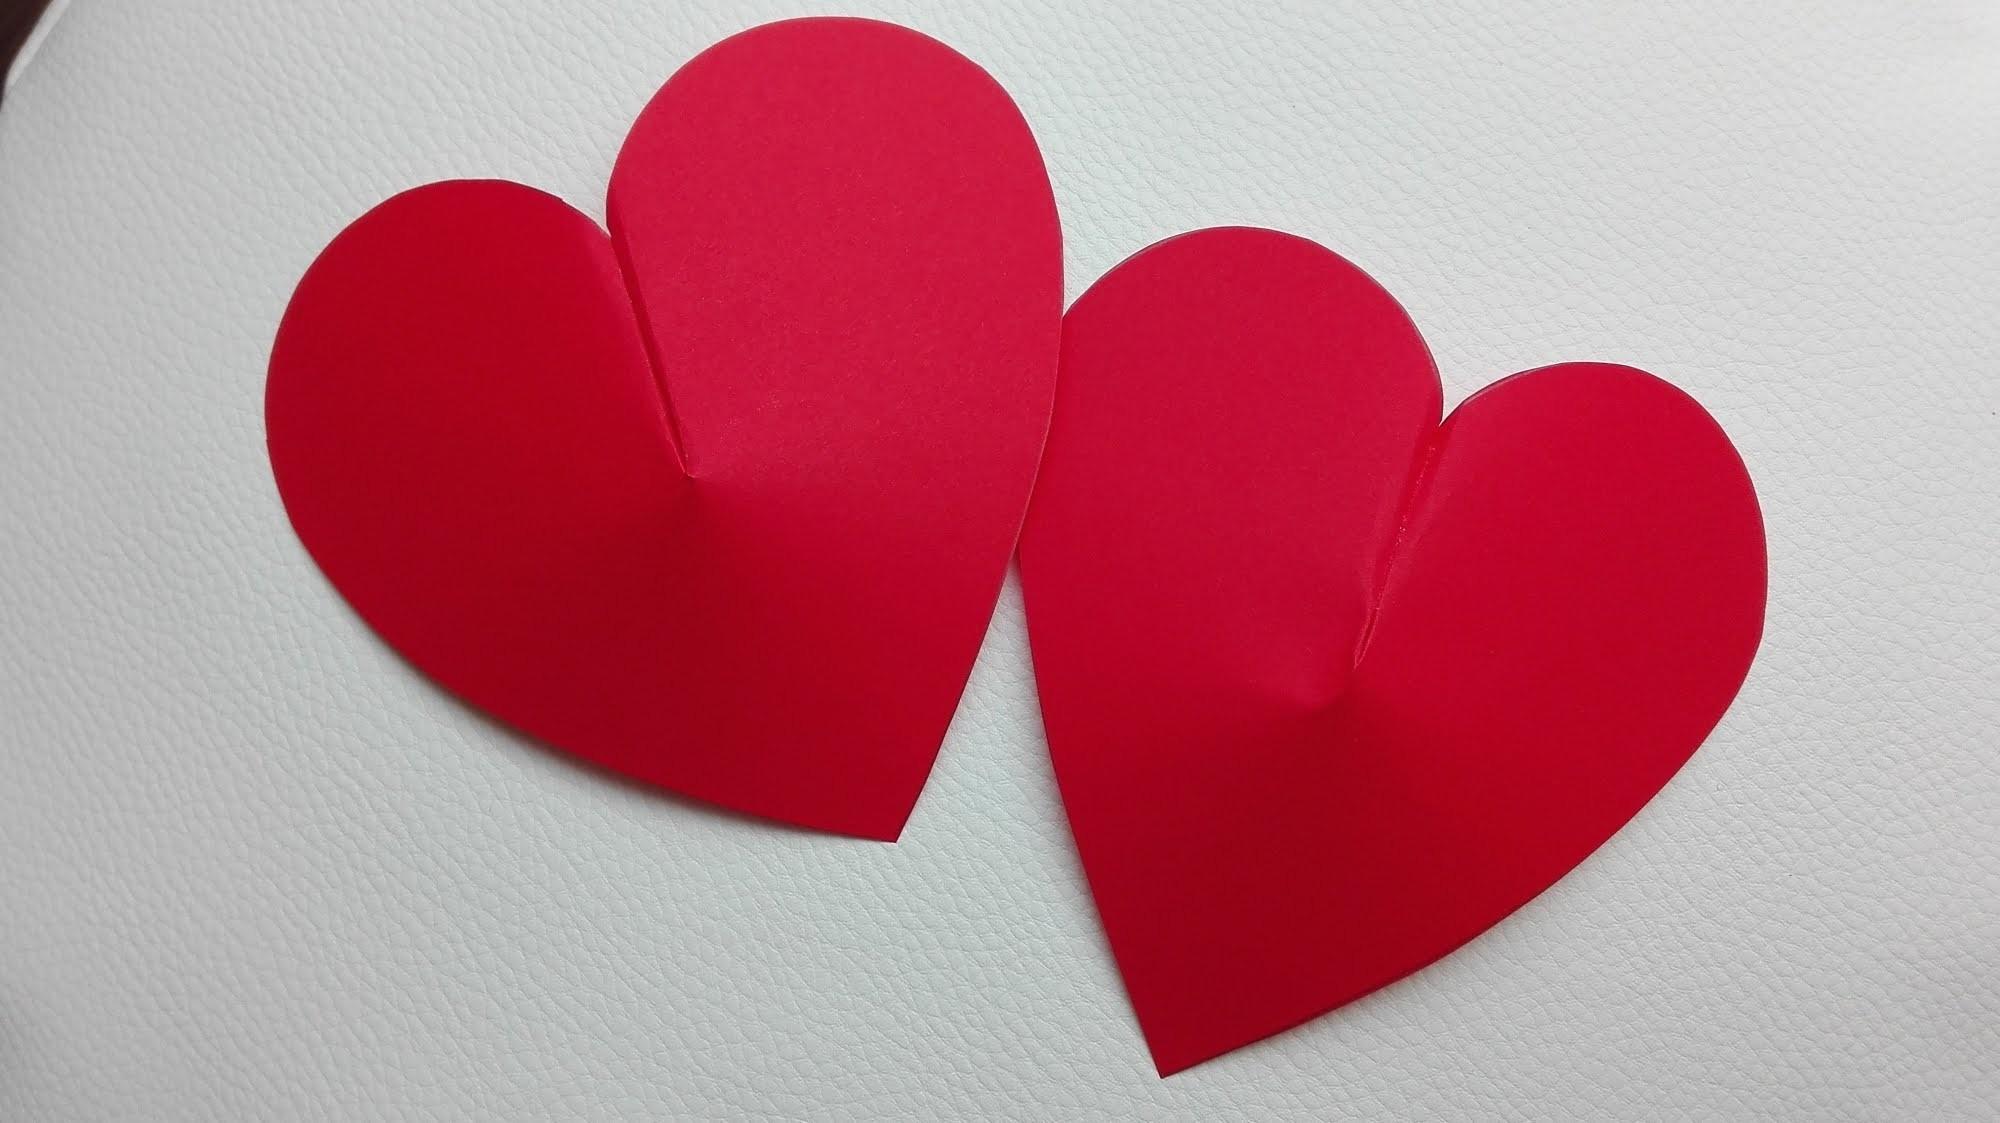 Jak zrobić Papierowe Serce 3D. How to make a 3D Paper Heart